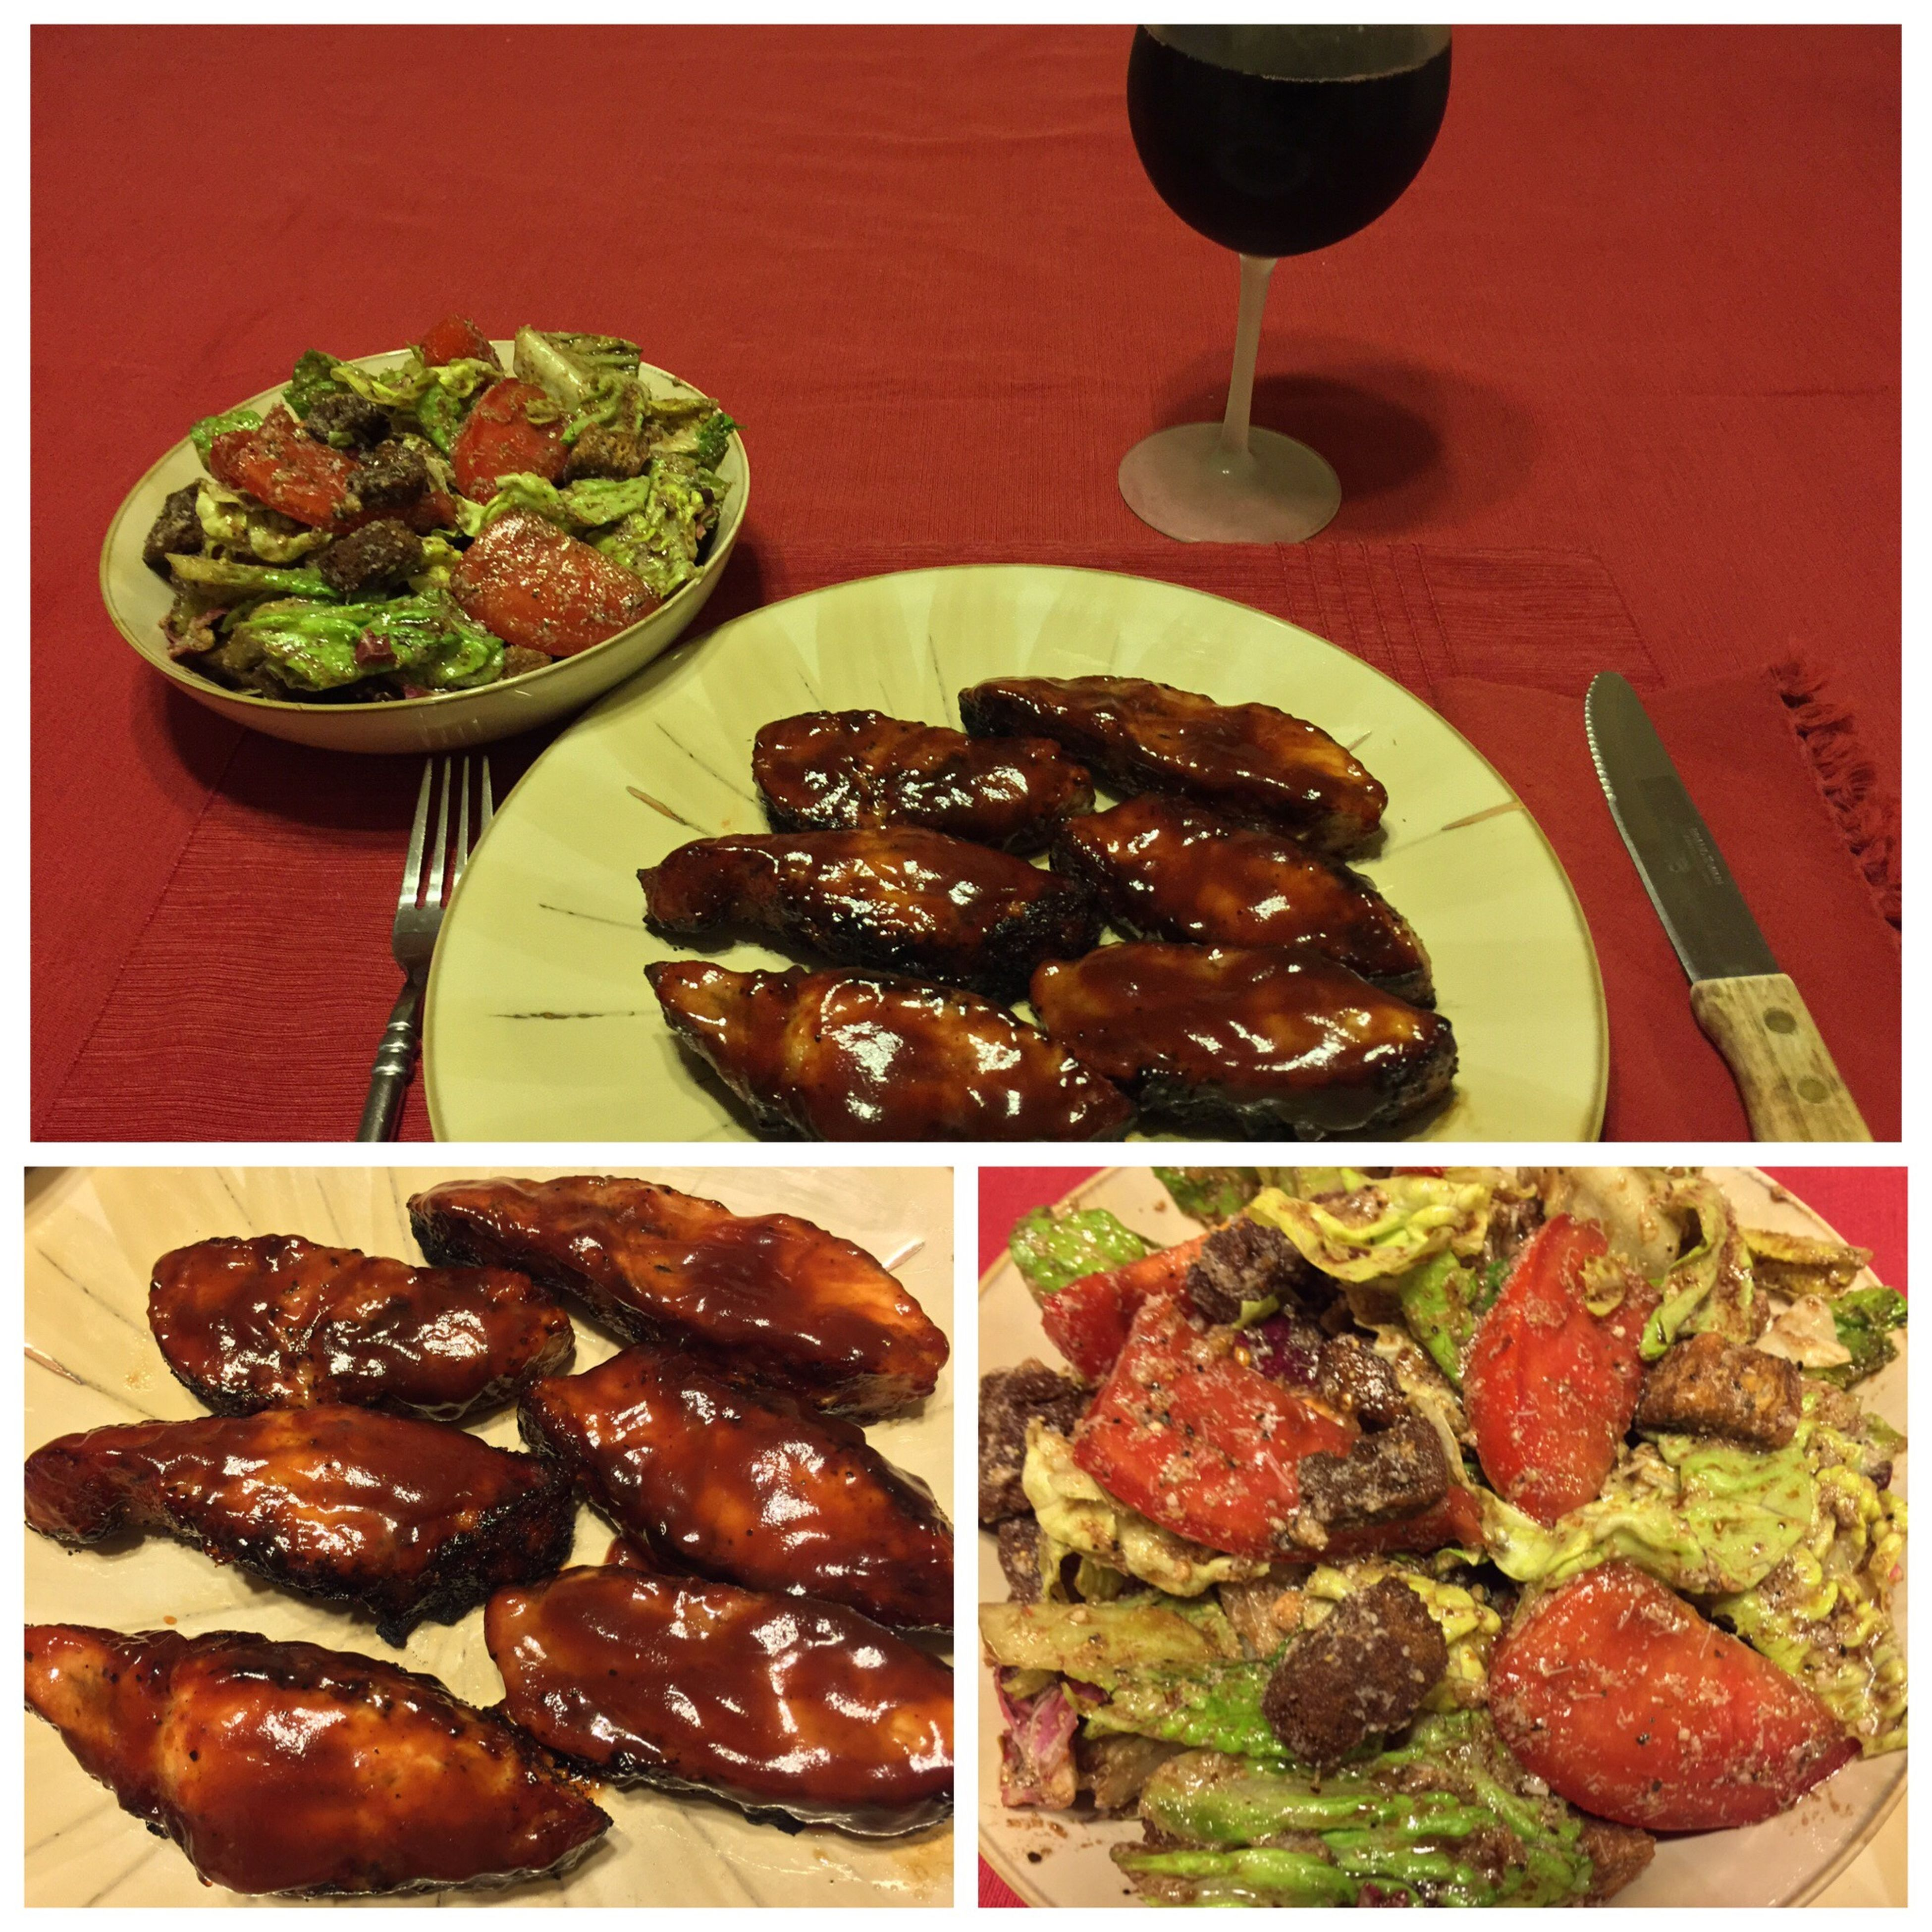 Tonight, I grilled boneless pork ribs with a pineapple BBQ sauce. Served with a nice salad and my homemade 2013 Italian Barbera wine. ICanCookMyAssOff ItsAnItalianThing Grilling HomemadeItalianWine Nomnombomb Food Porn Awards MyFoodPics Food Porn